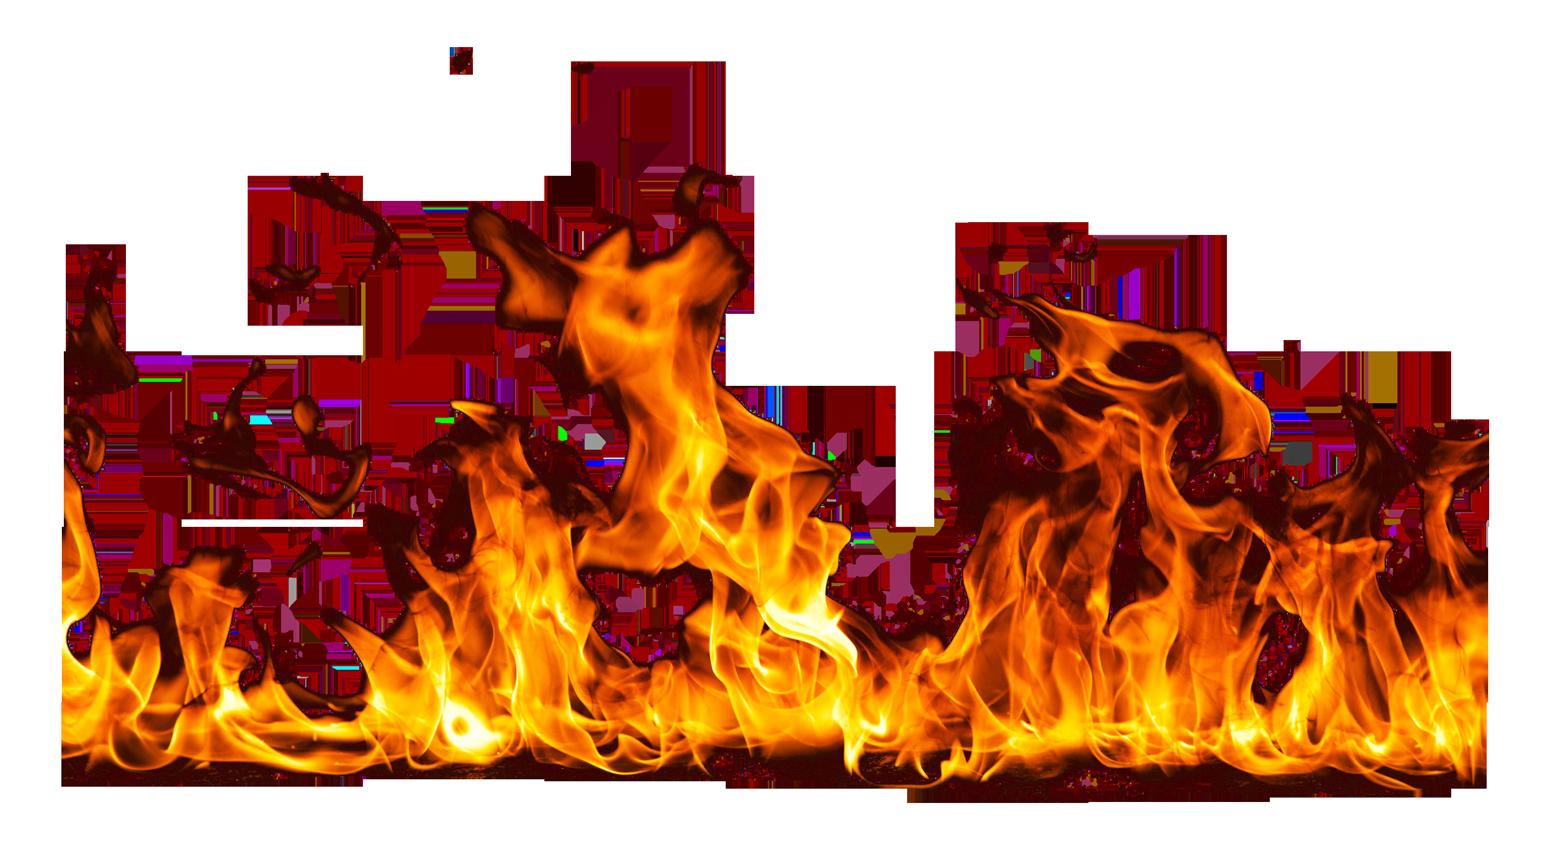 Png image download transparentpng. Clipart fire font